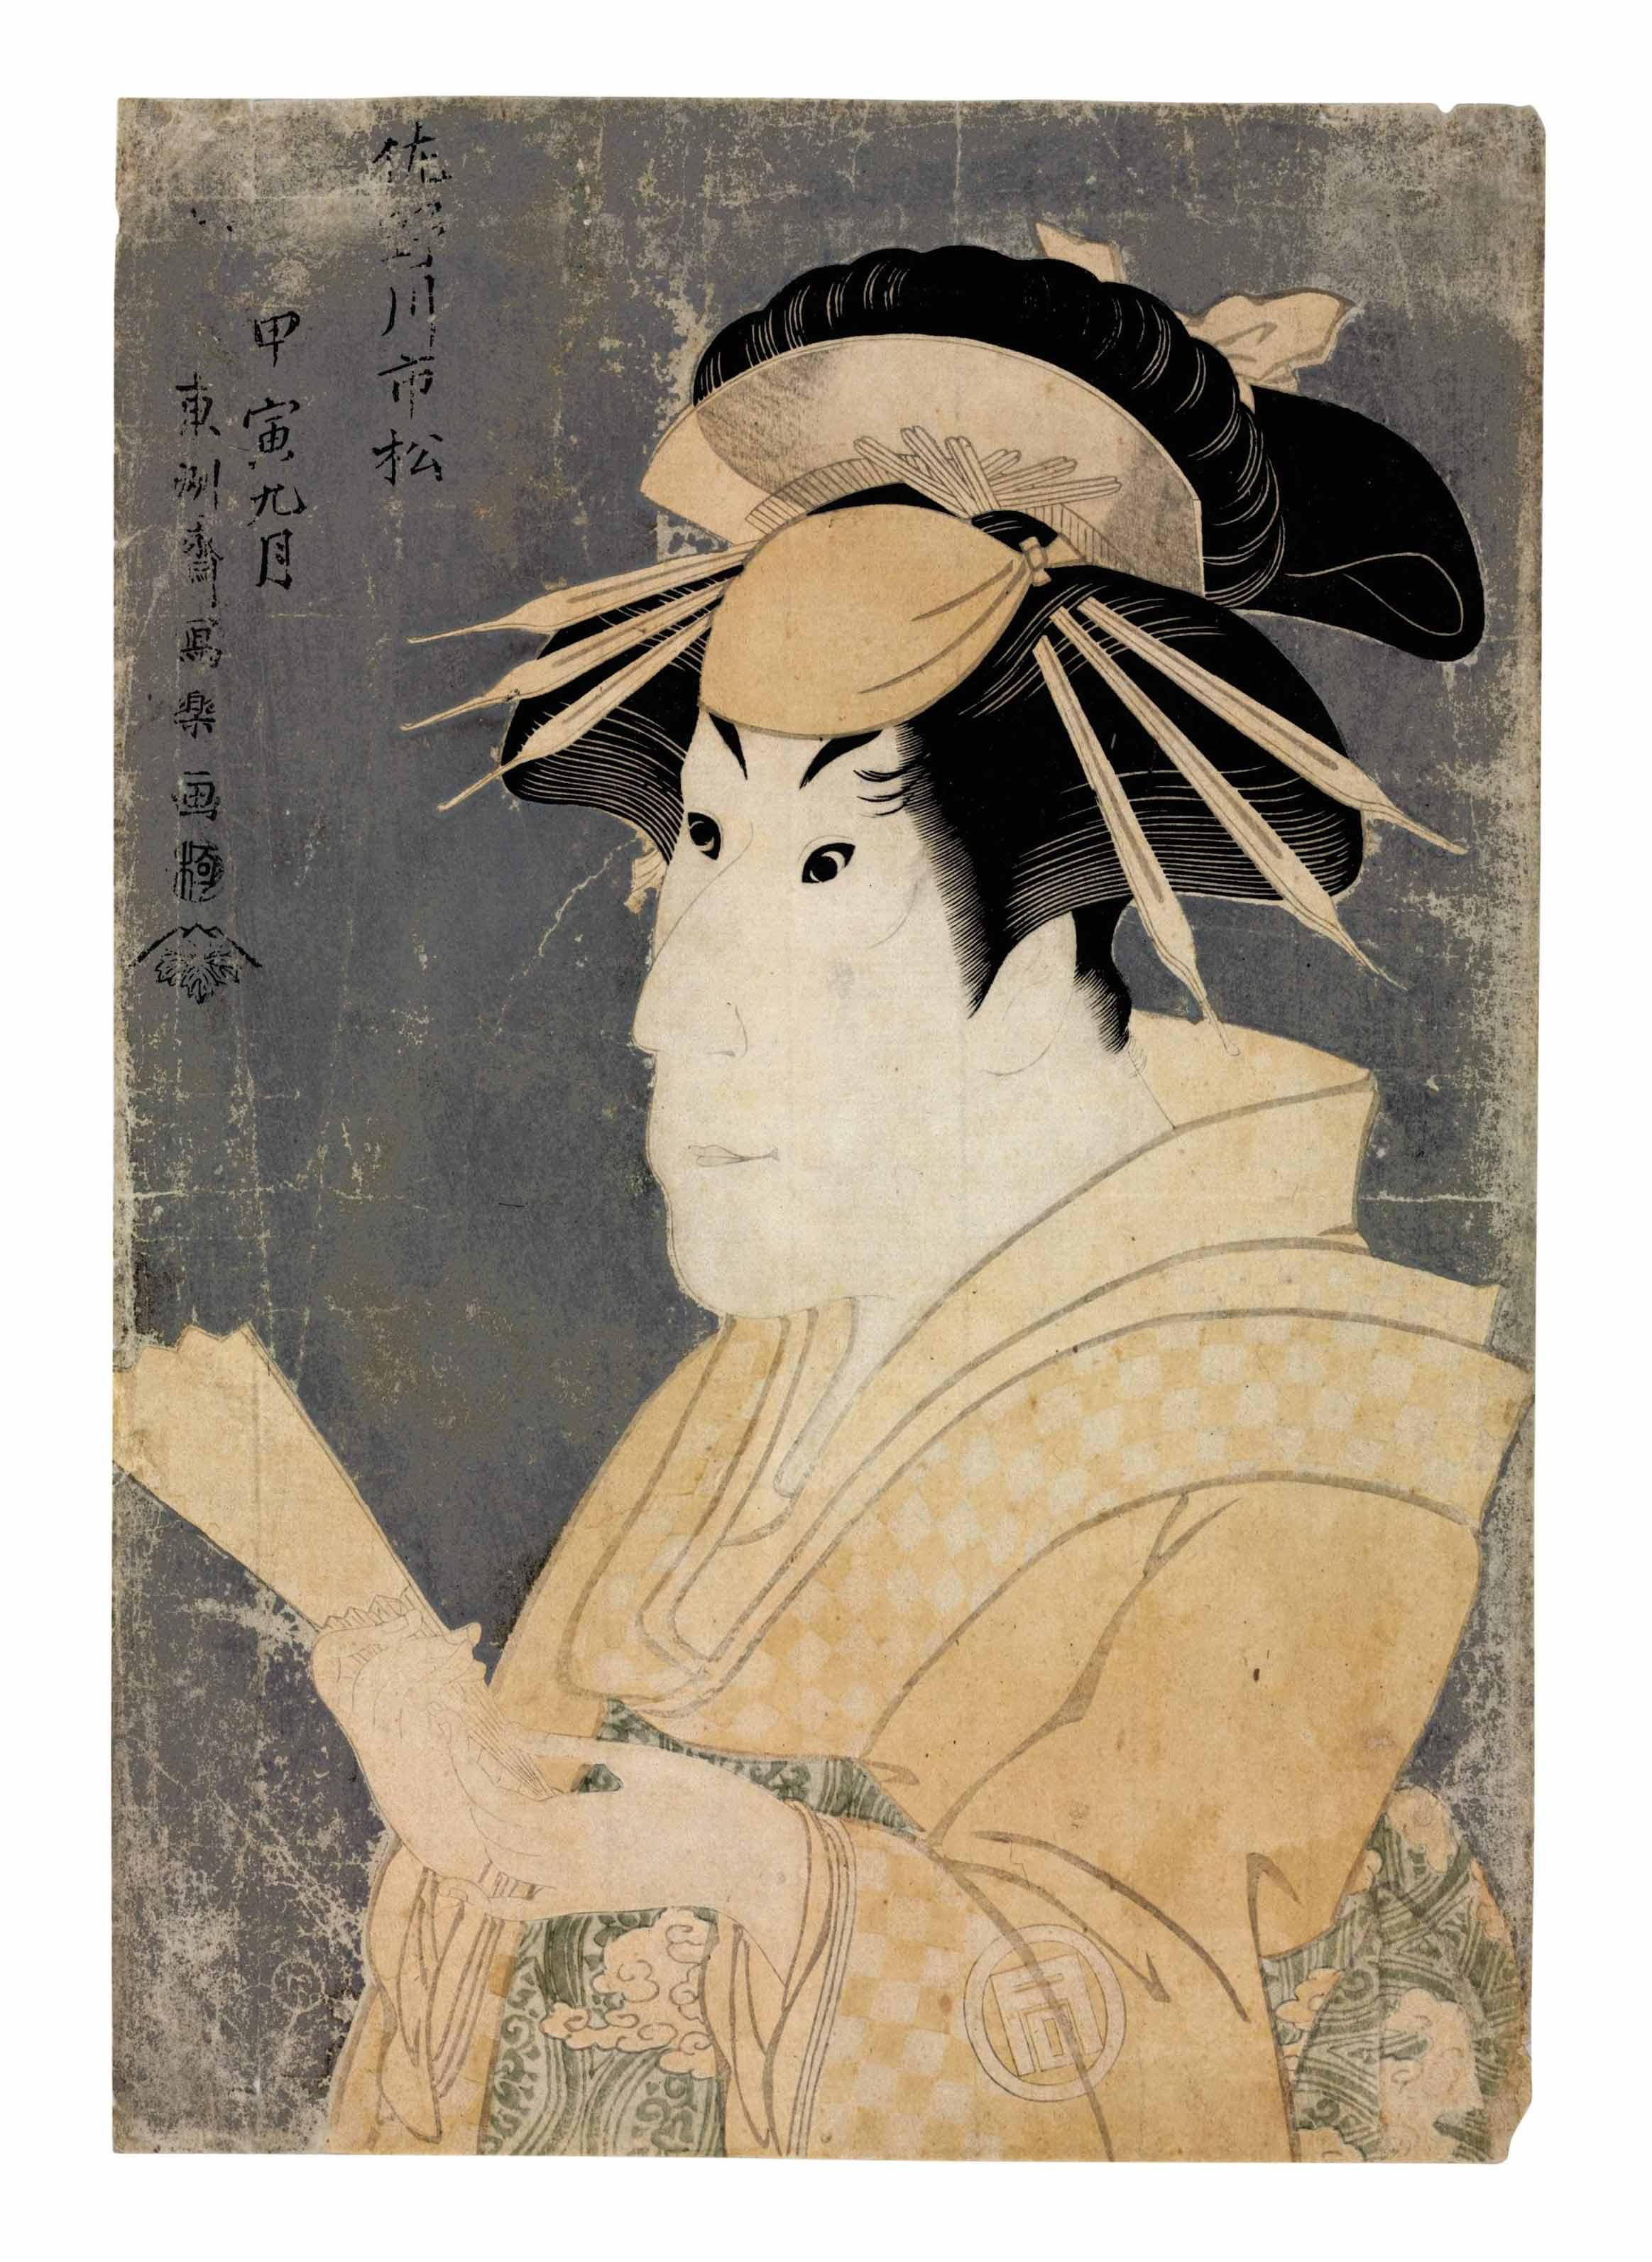 The Actor Sanogawa Ichimatsu III as the Prostitute Onayo of Gion in the Kabuki Play Hanaayame Bunroku Soga (The Iris Soga of the Bunroku Era)